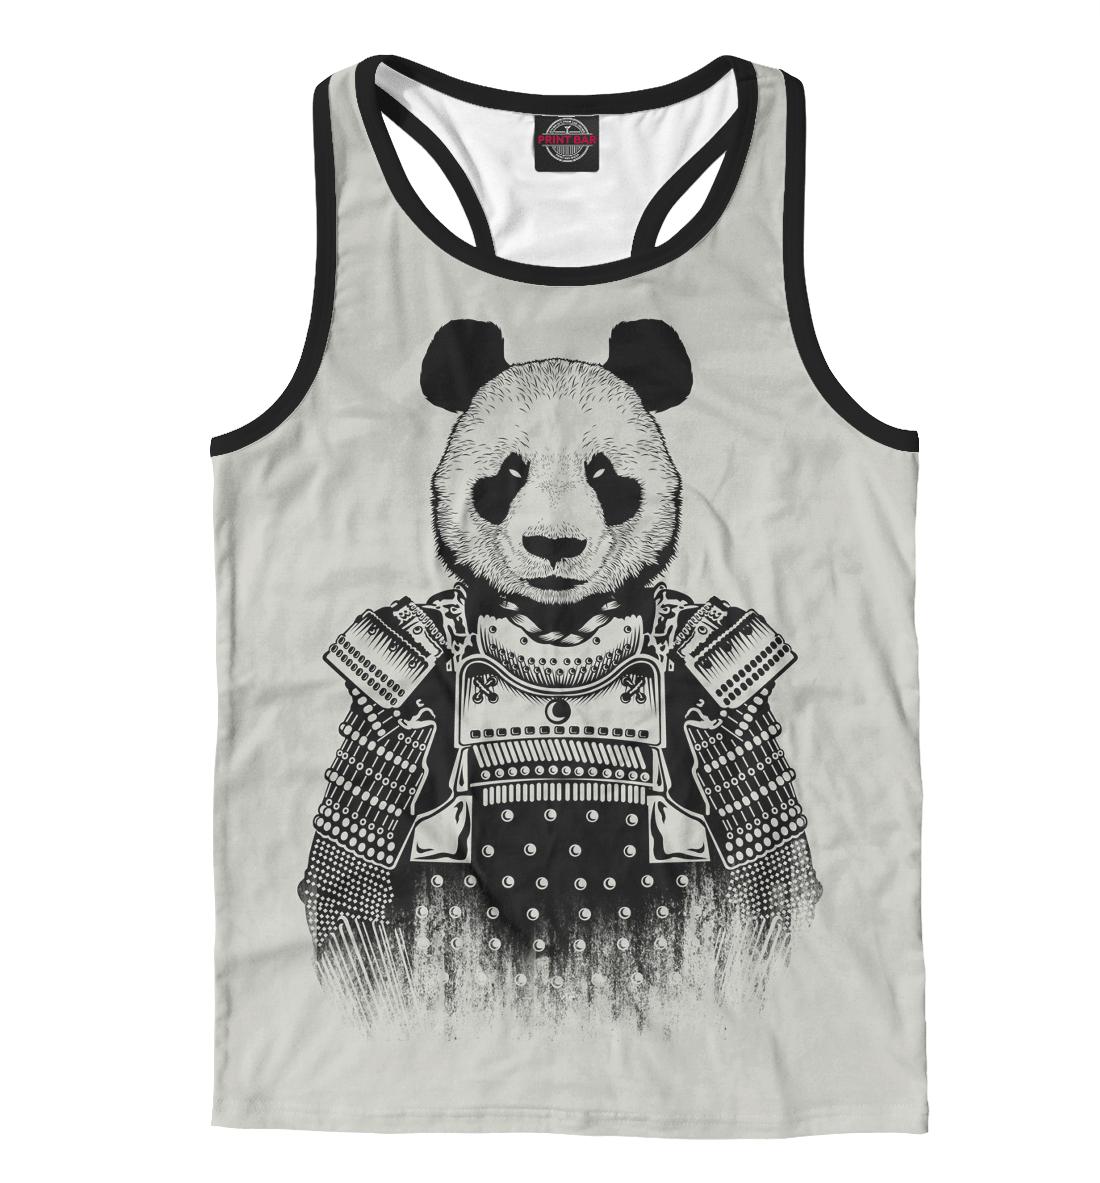 Купить Panda Samurai, Printbar, Майки борцовки, PAN-698163-mayb-2